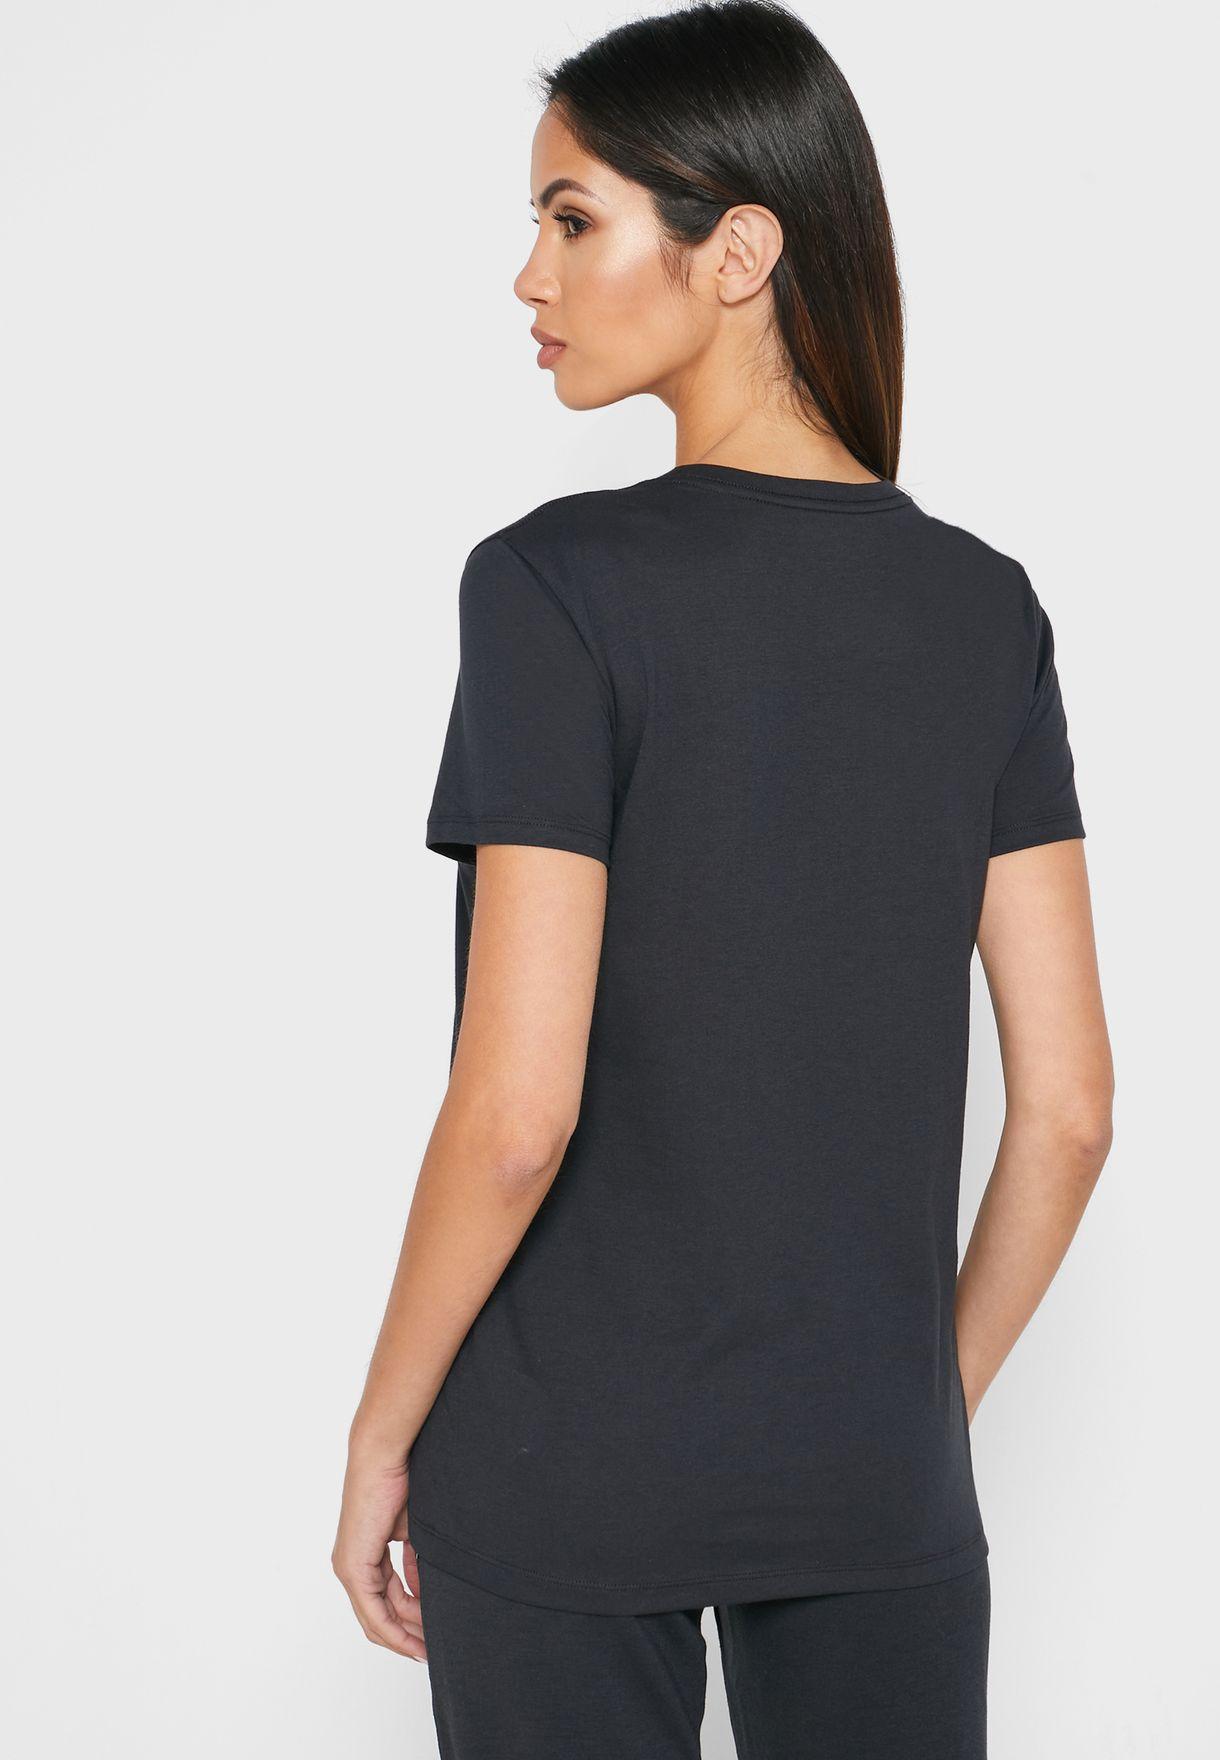 Sportstyle Classics Graphic T-Shirt